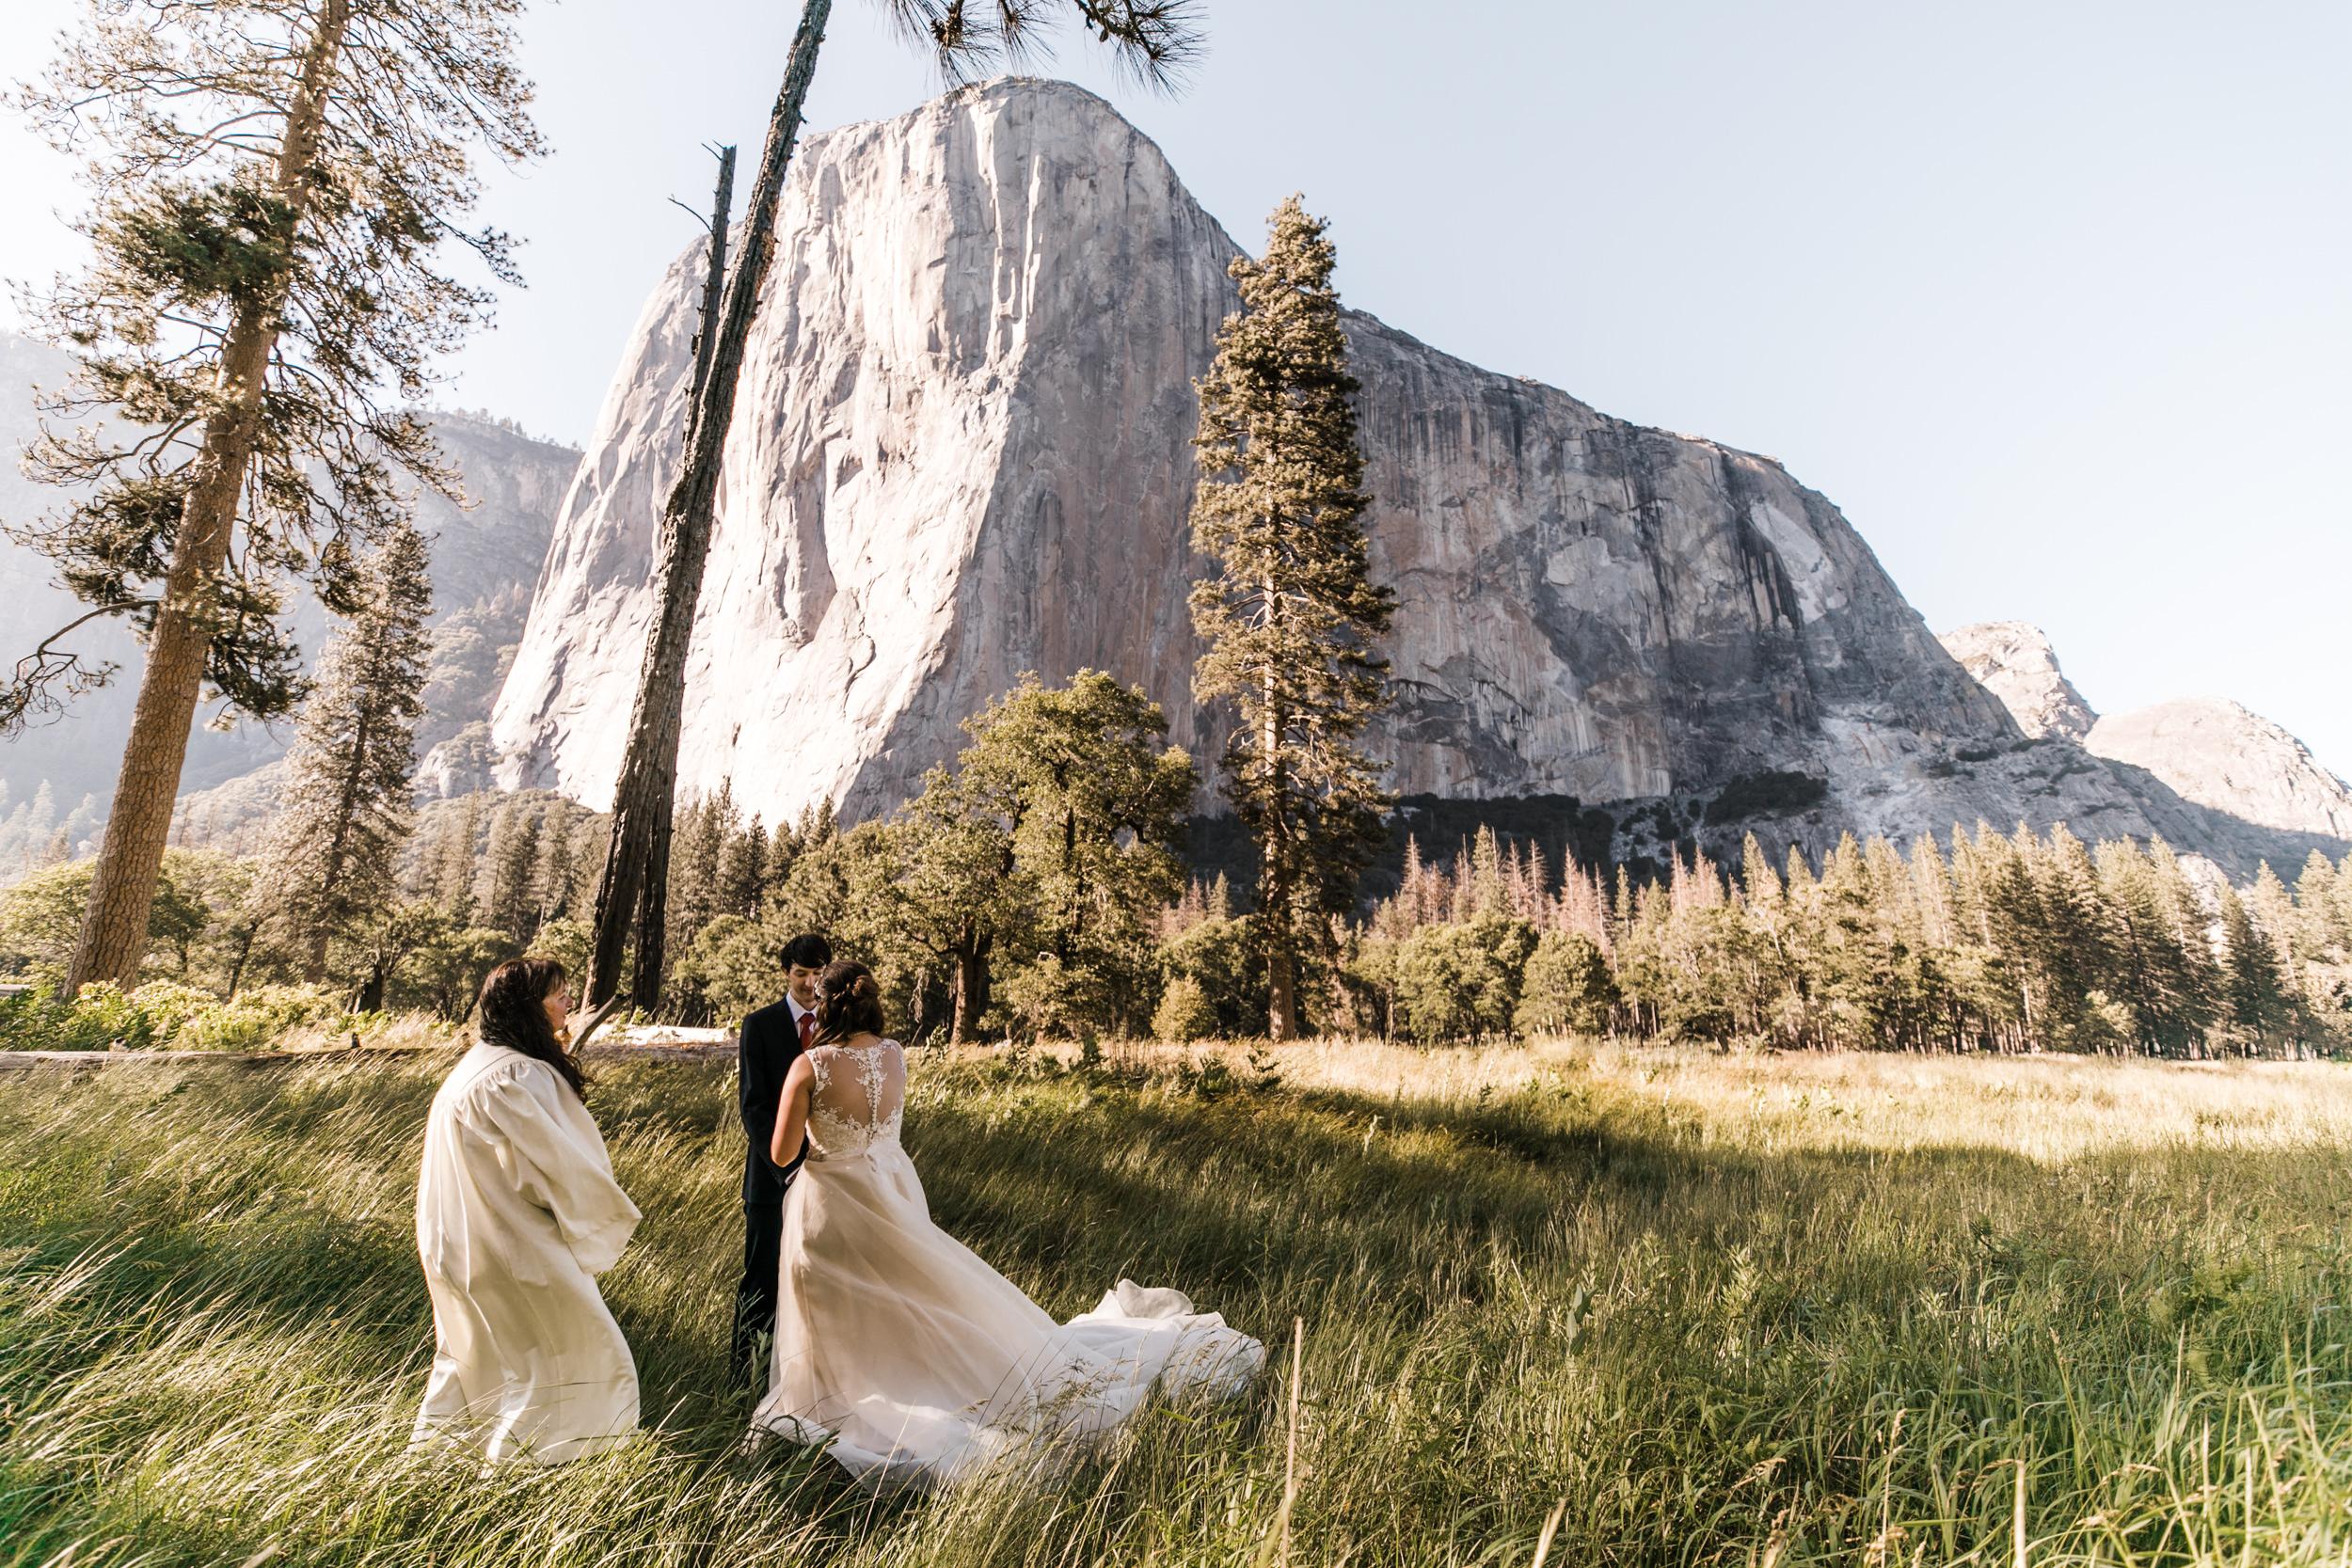 Yosemite-National-Park-Wedding-Photographer-Adventure-Wedding-Photos-Hearnes-Elopement-Photography-El-Cap-Meadow-Ceremony-Glacier-Point-Sunset-13.jpg